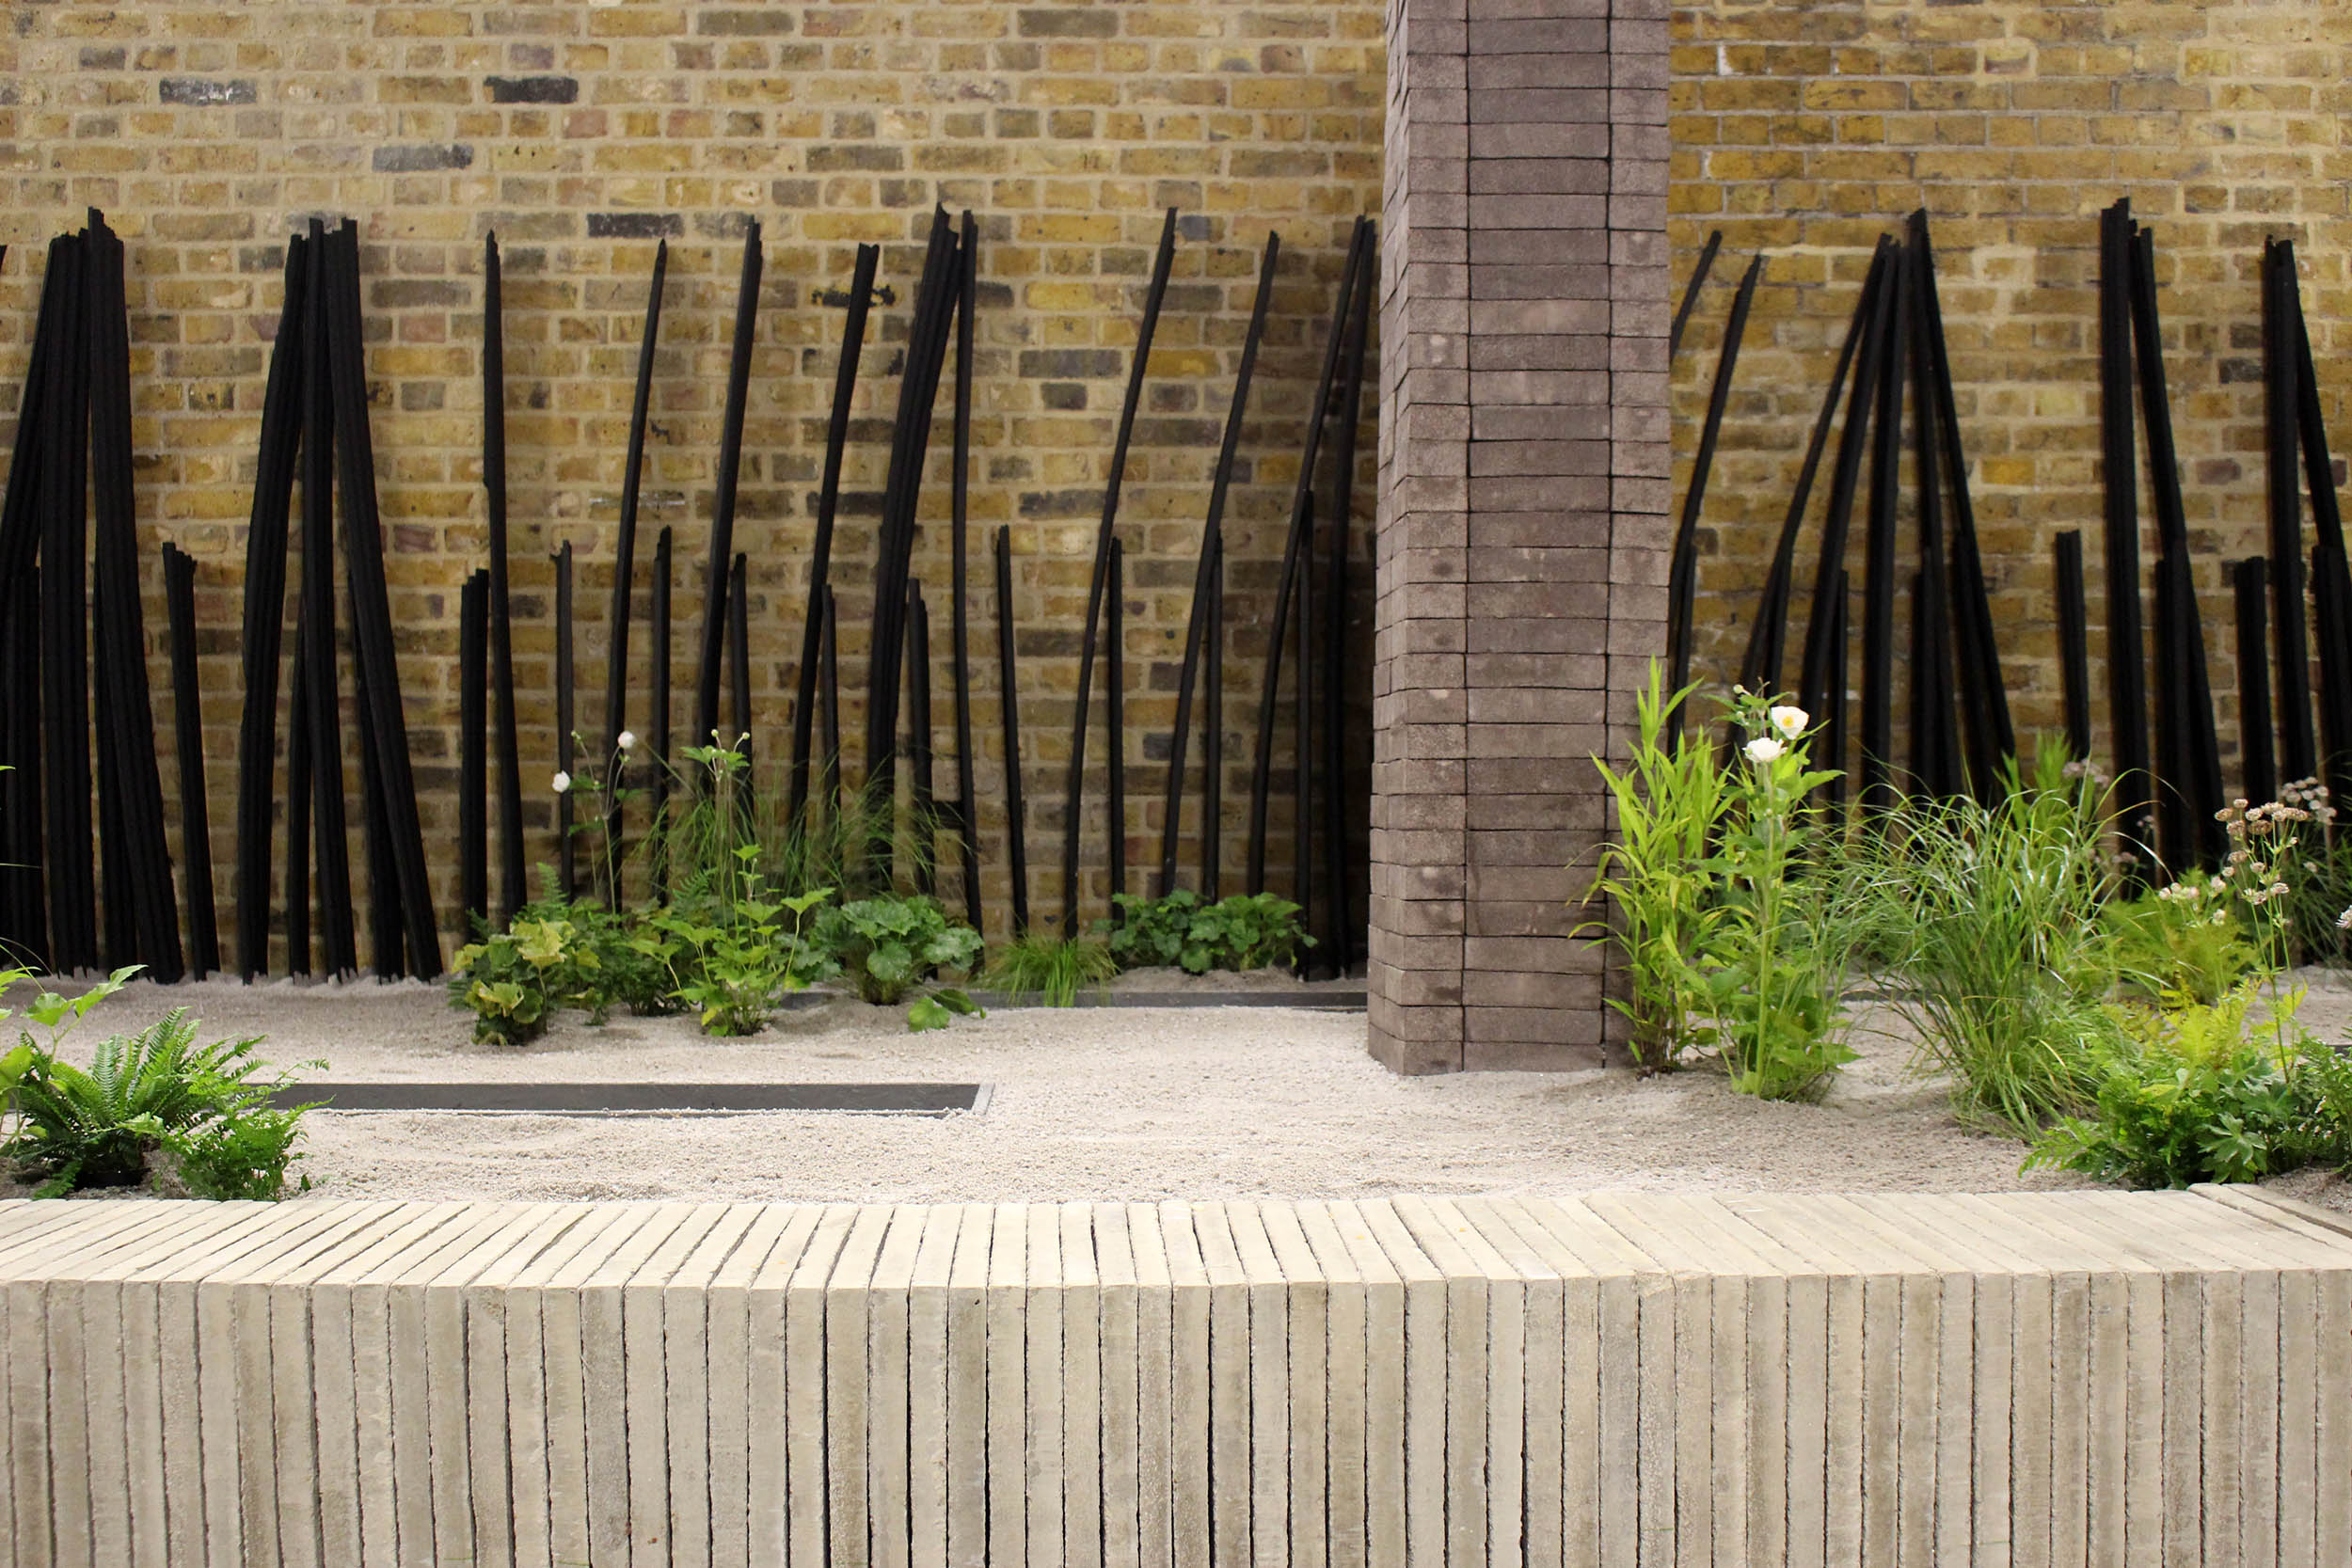 london-bridge-garden-installation-minimalist-forms-composition.jpg